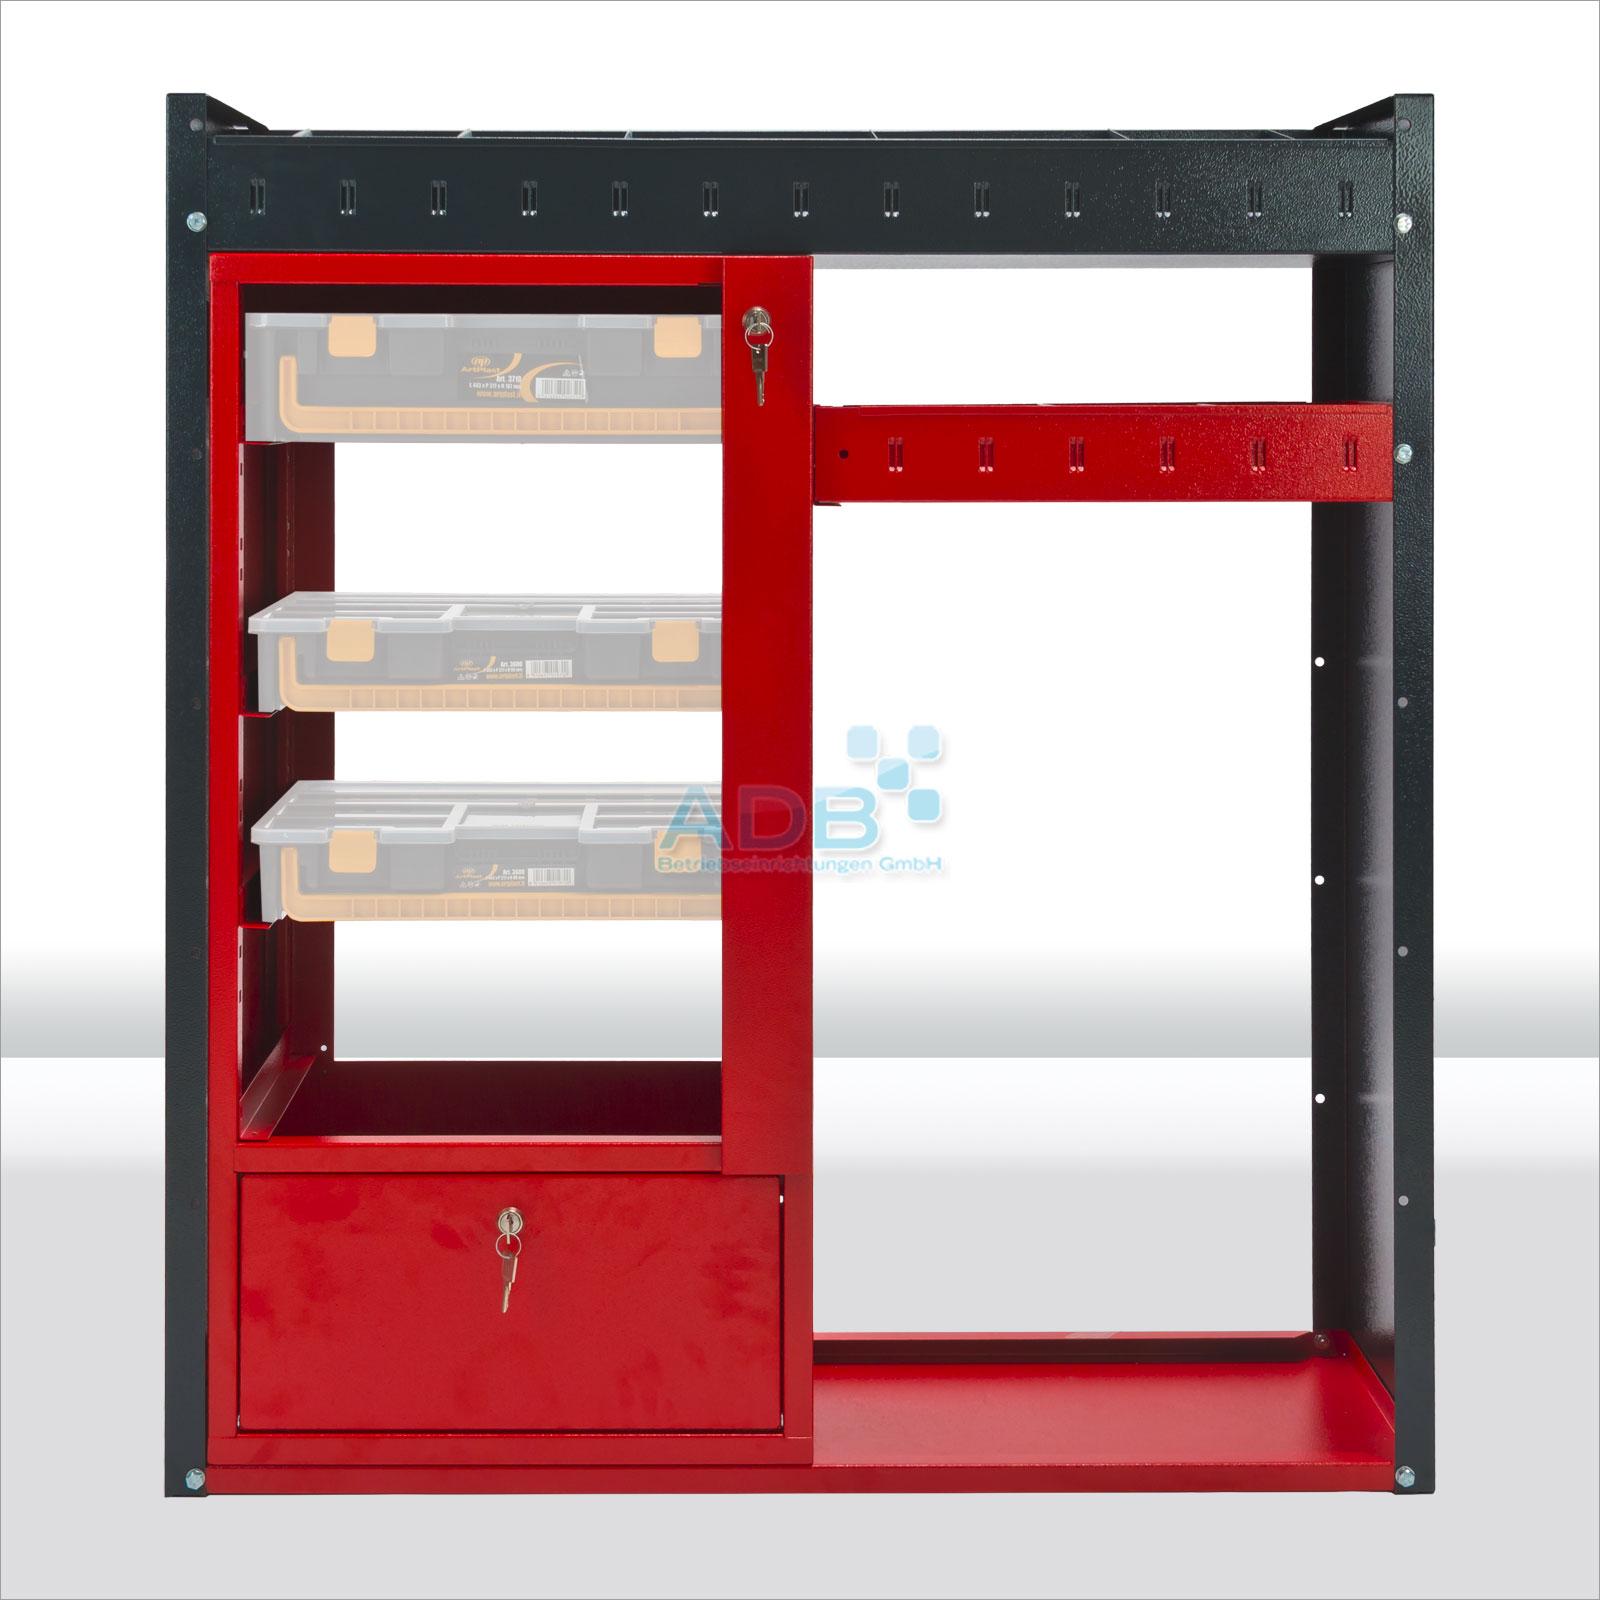 182399 fahrzeugeinrichtung kfz regal fahrzeugregal systemregal regal 40723 ebay. Black Bedroom Furniture Sets. Home Design Ideas